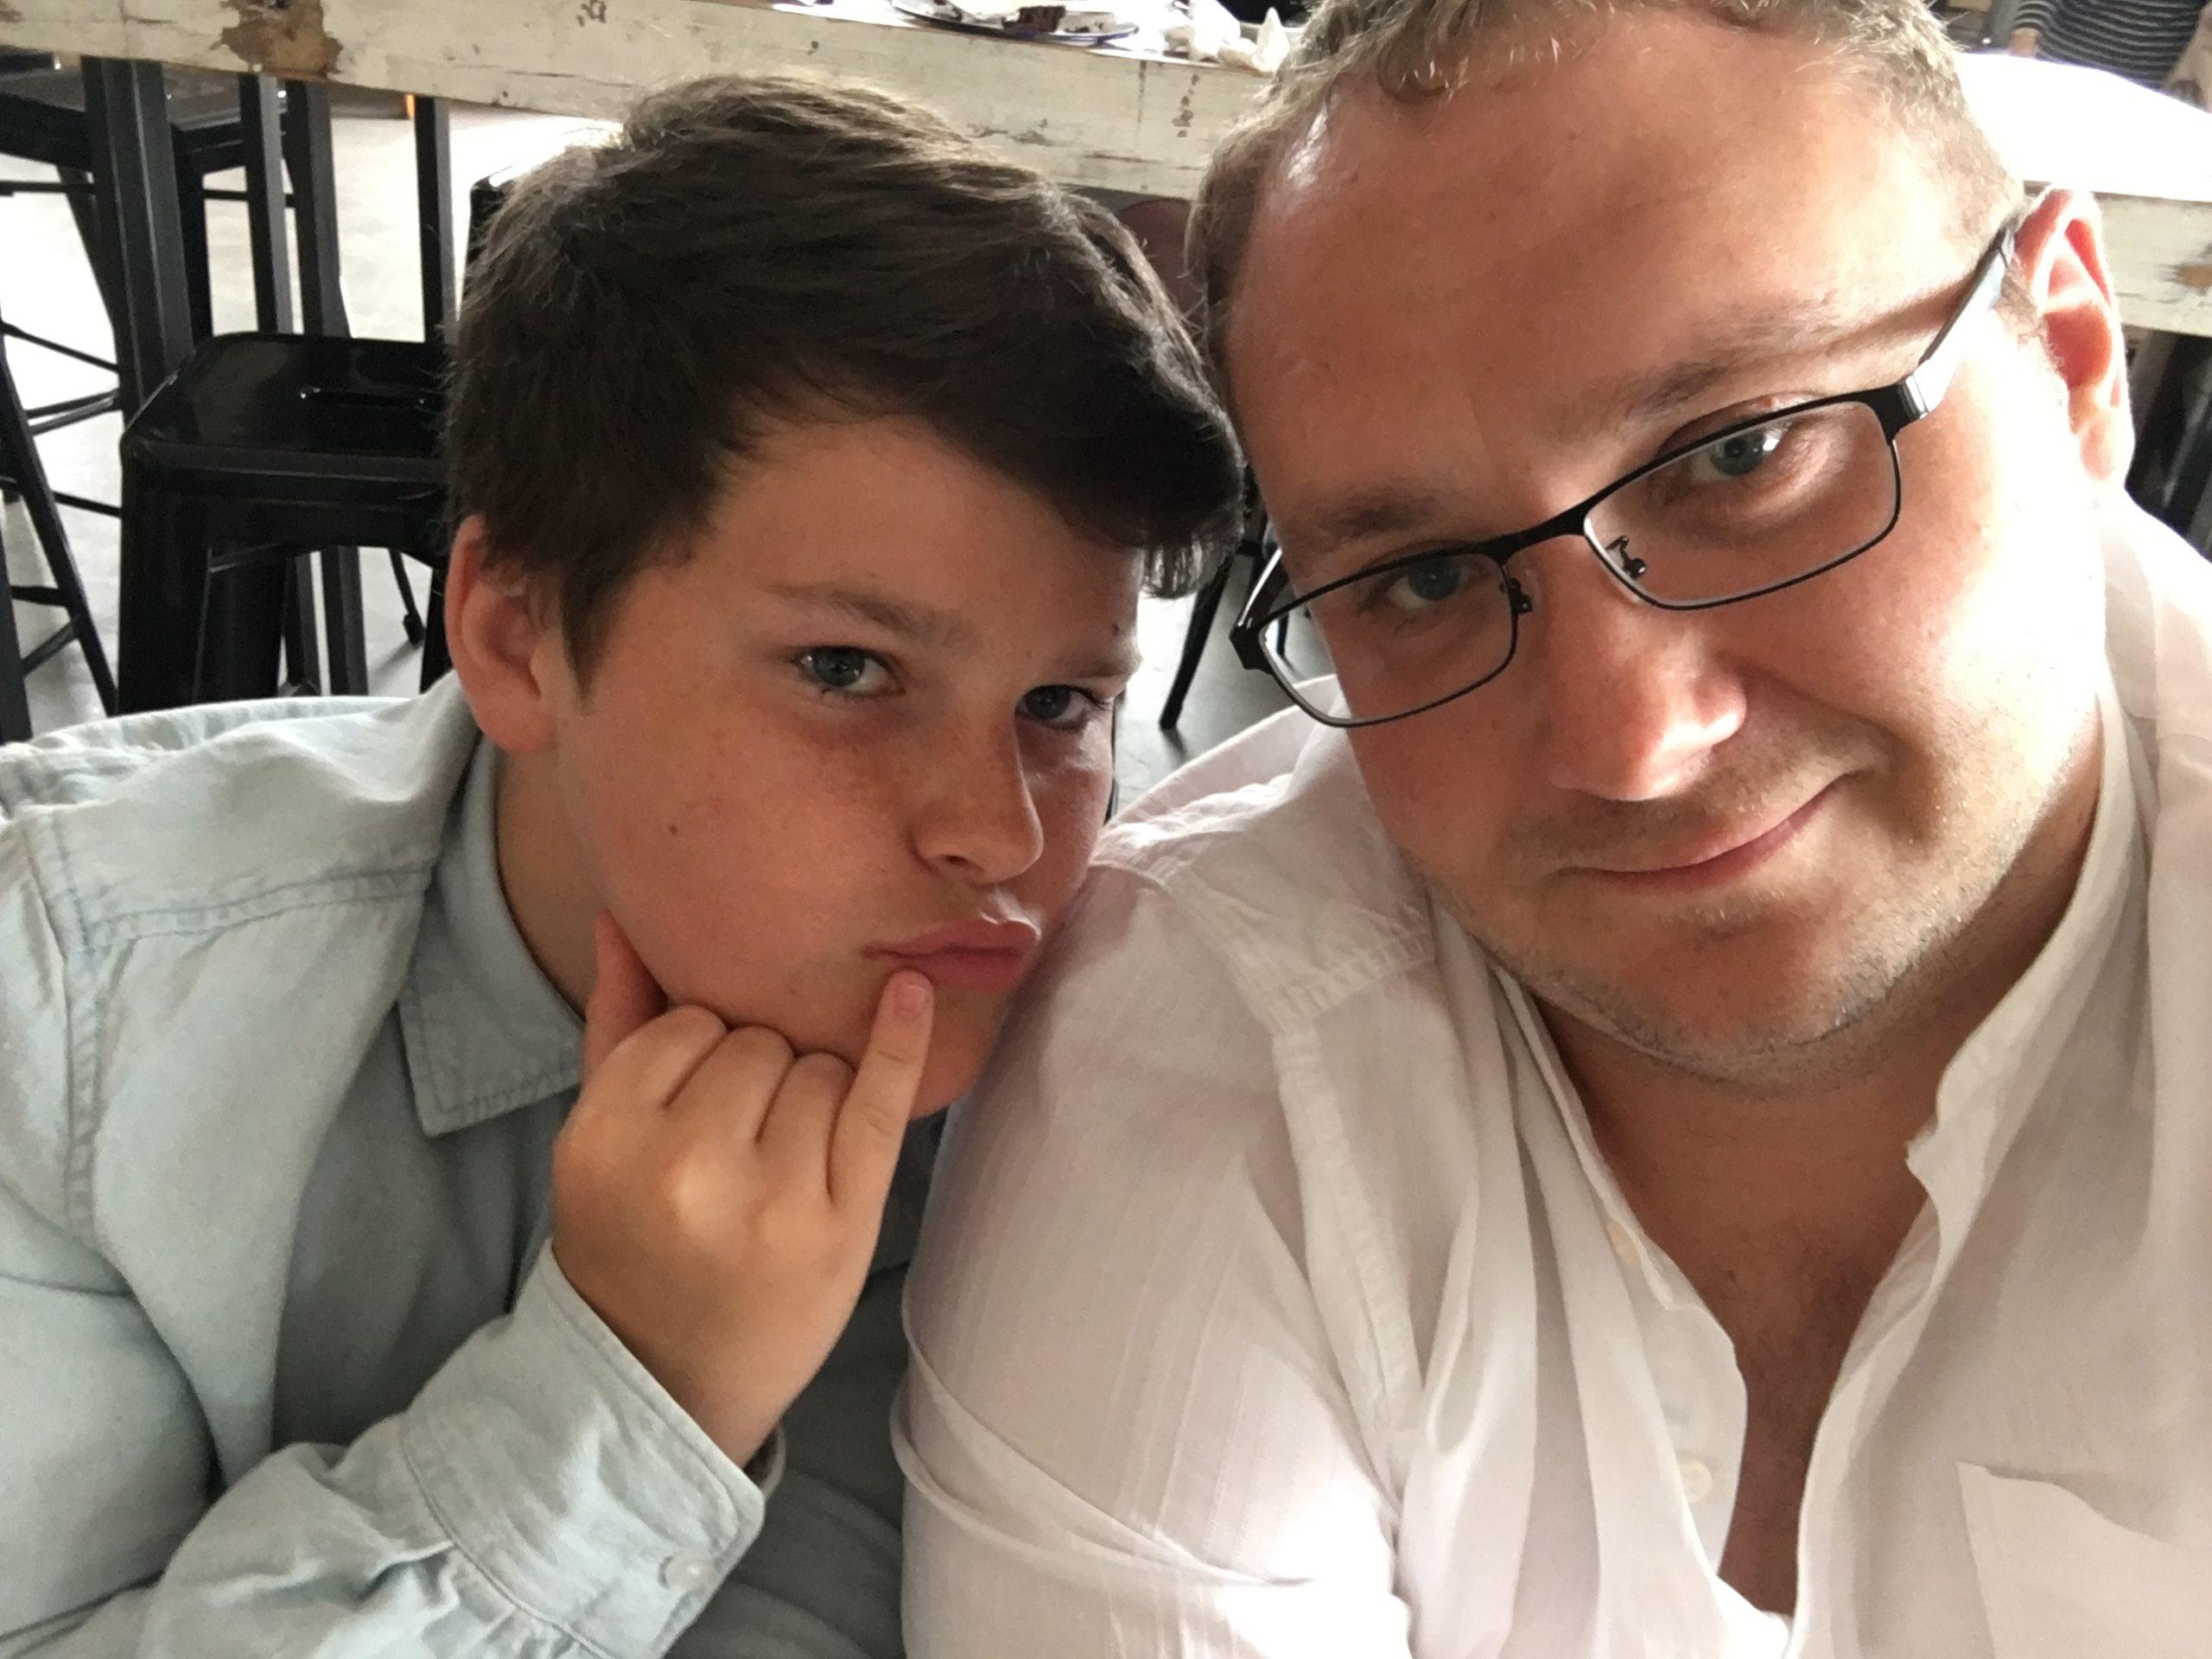 Zak and Jon